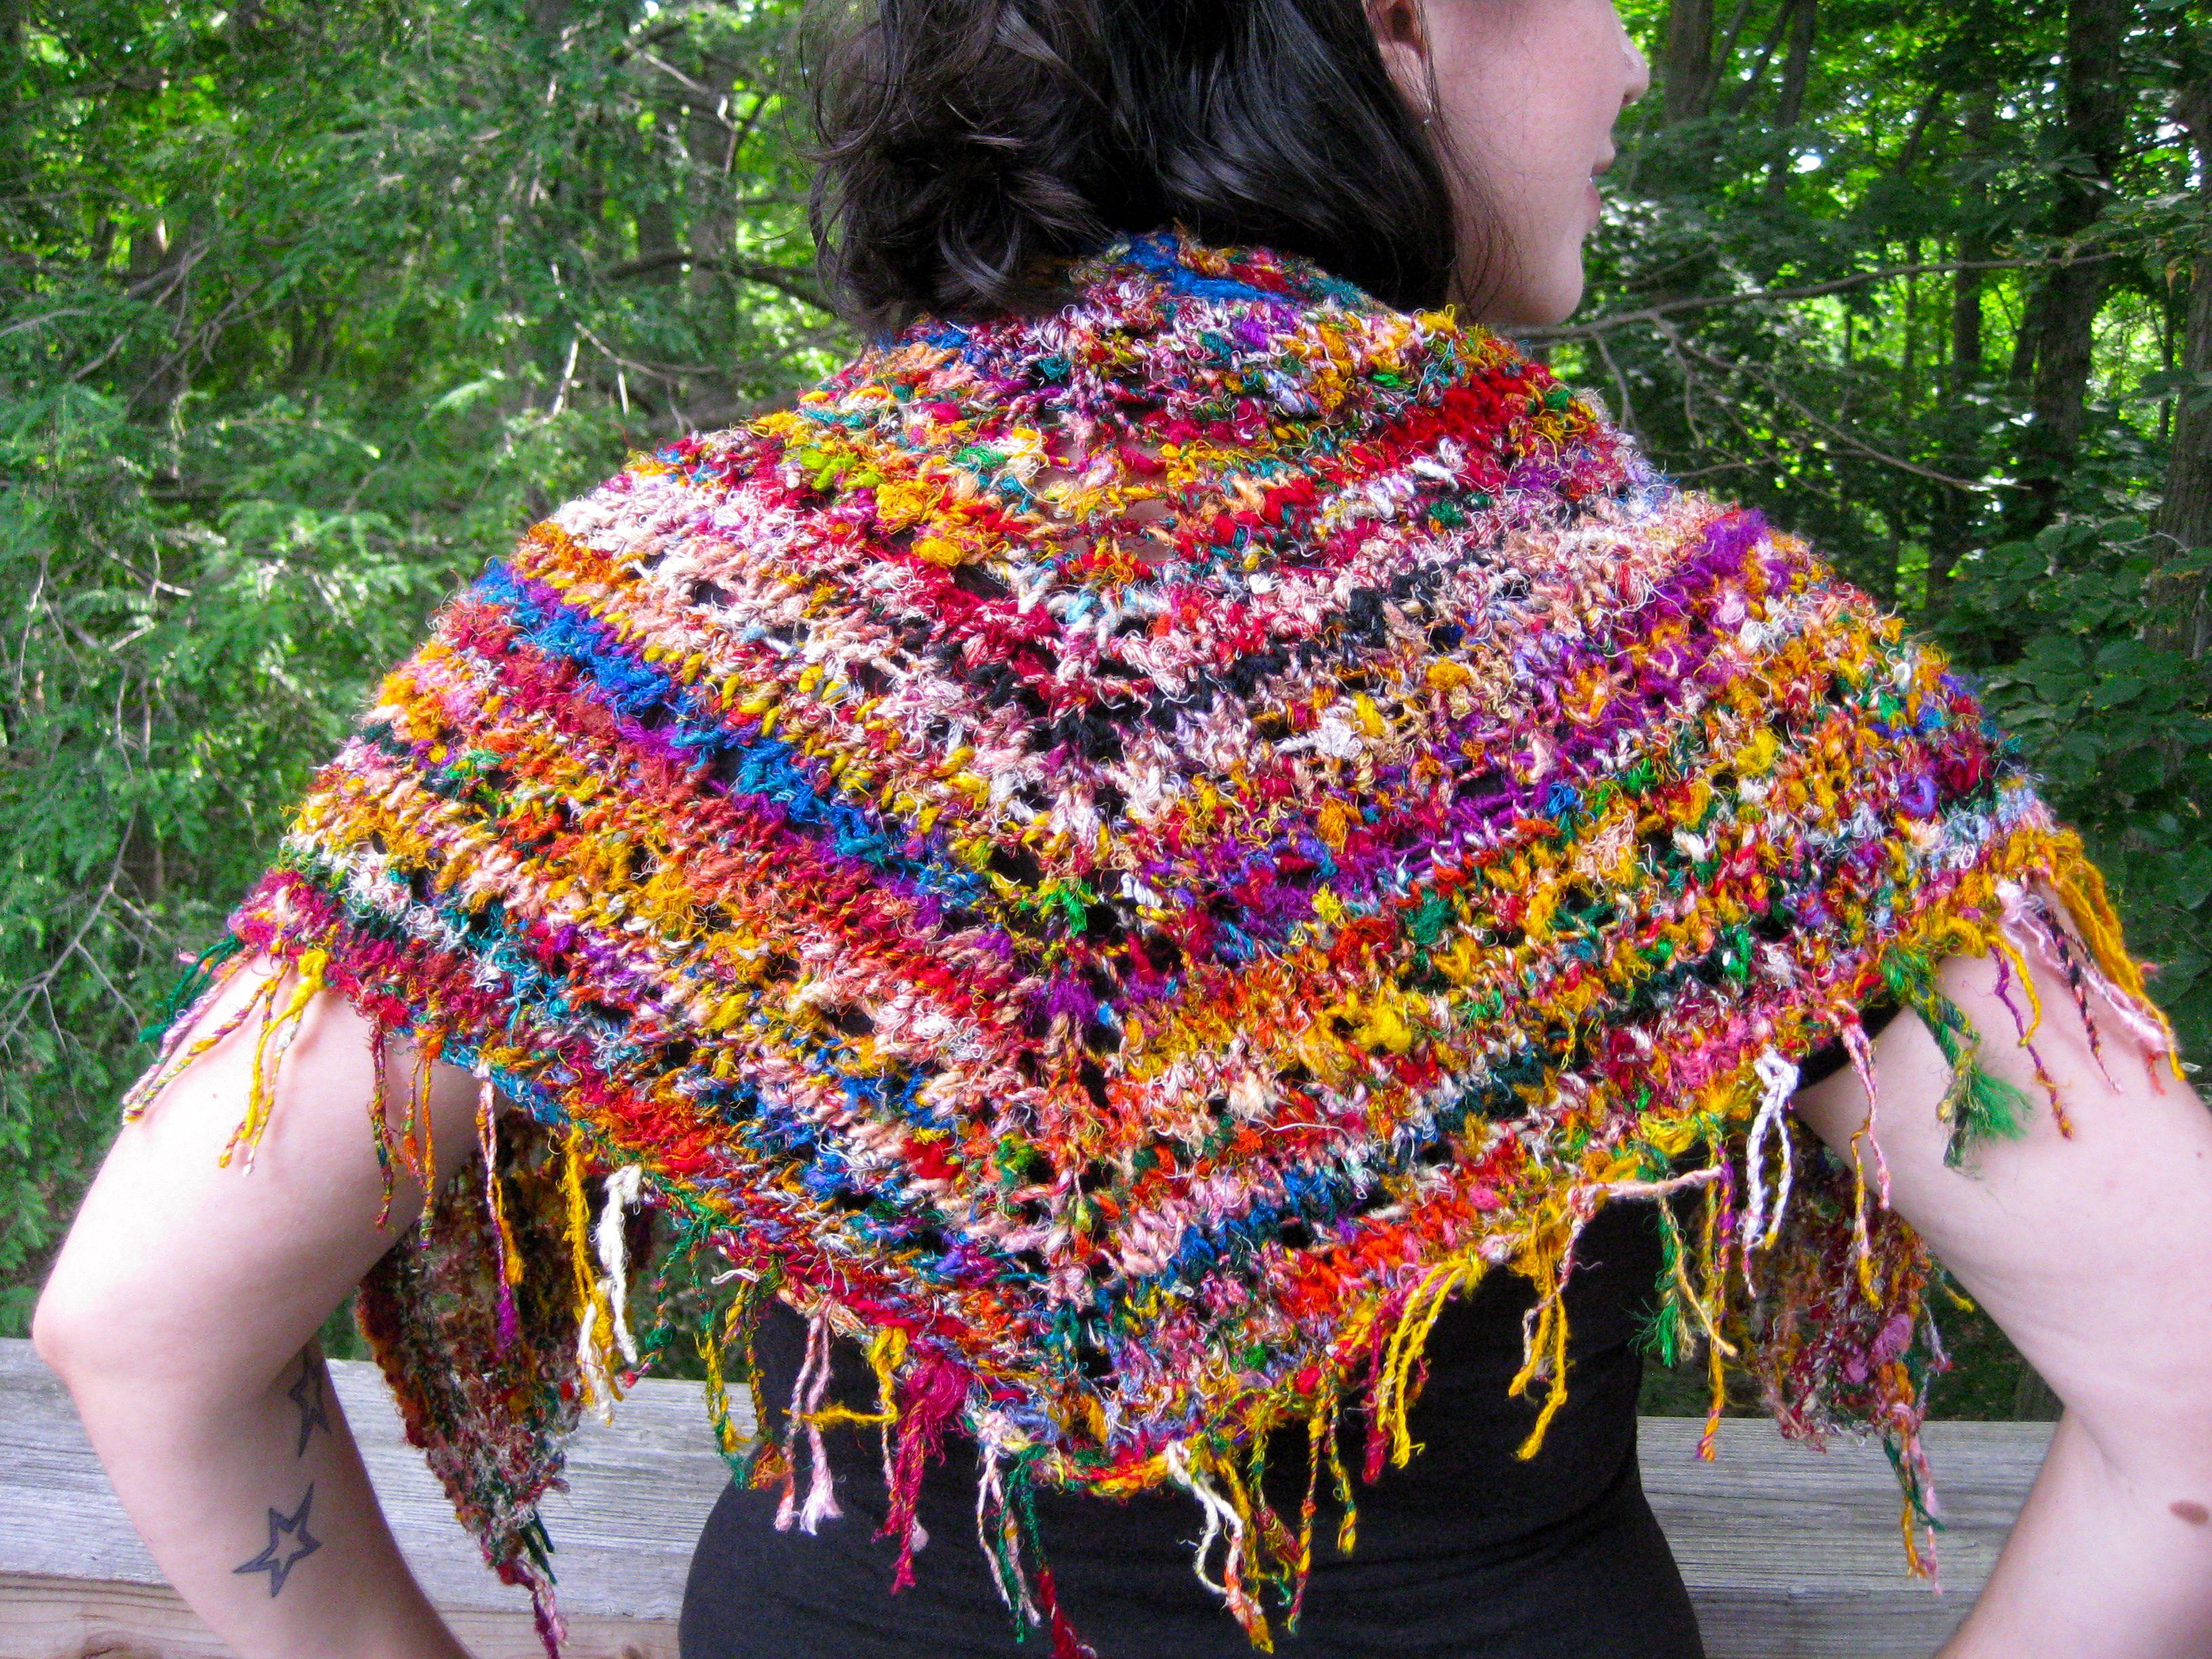 Sari yarn crochet patterns knitted but inspiration crochet sari yarn crochet patterns knitted but inspiration bankloansurffo Gallery